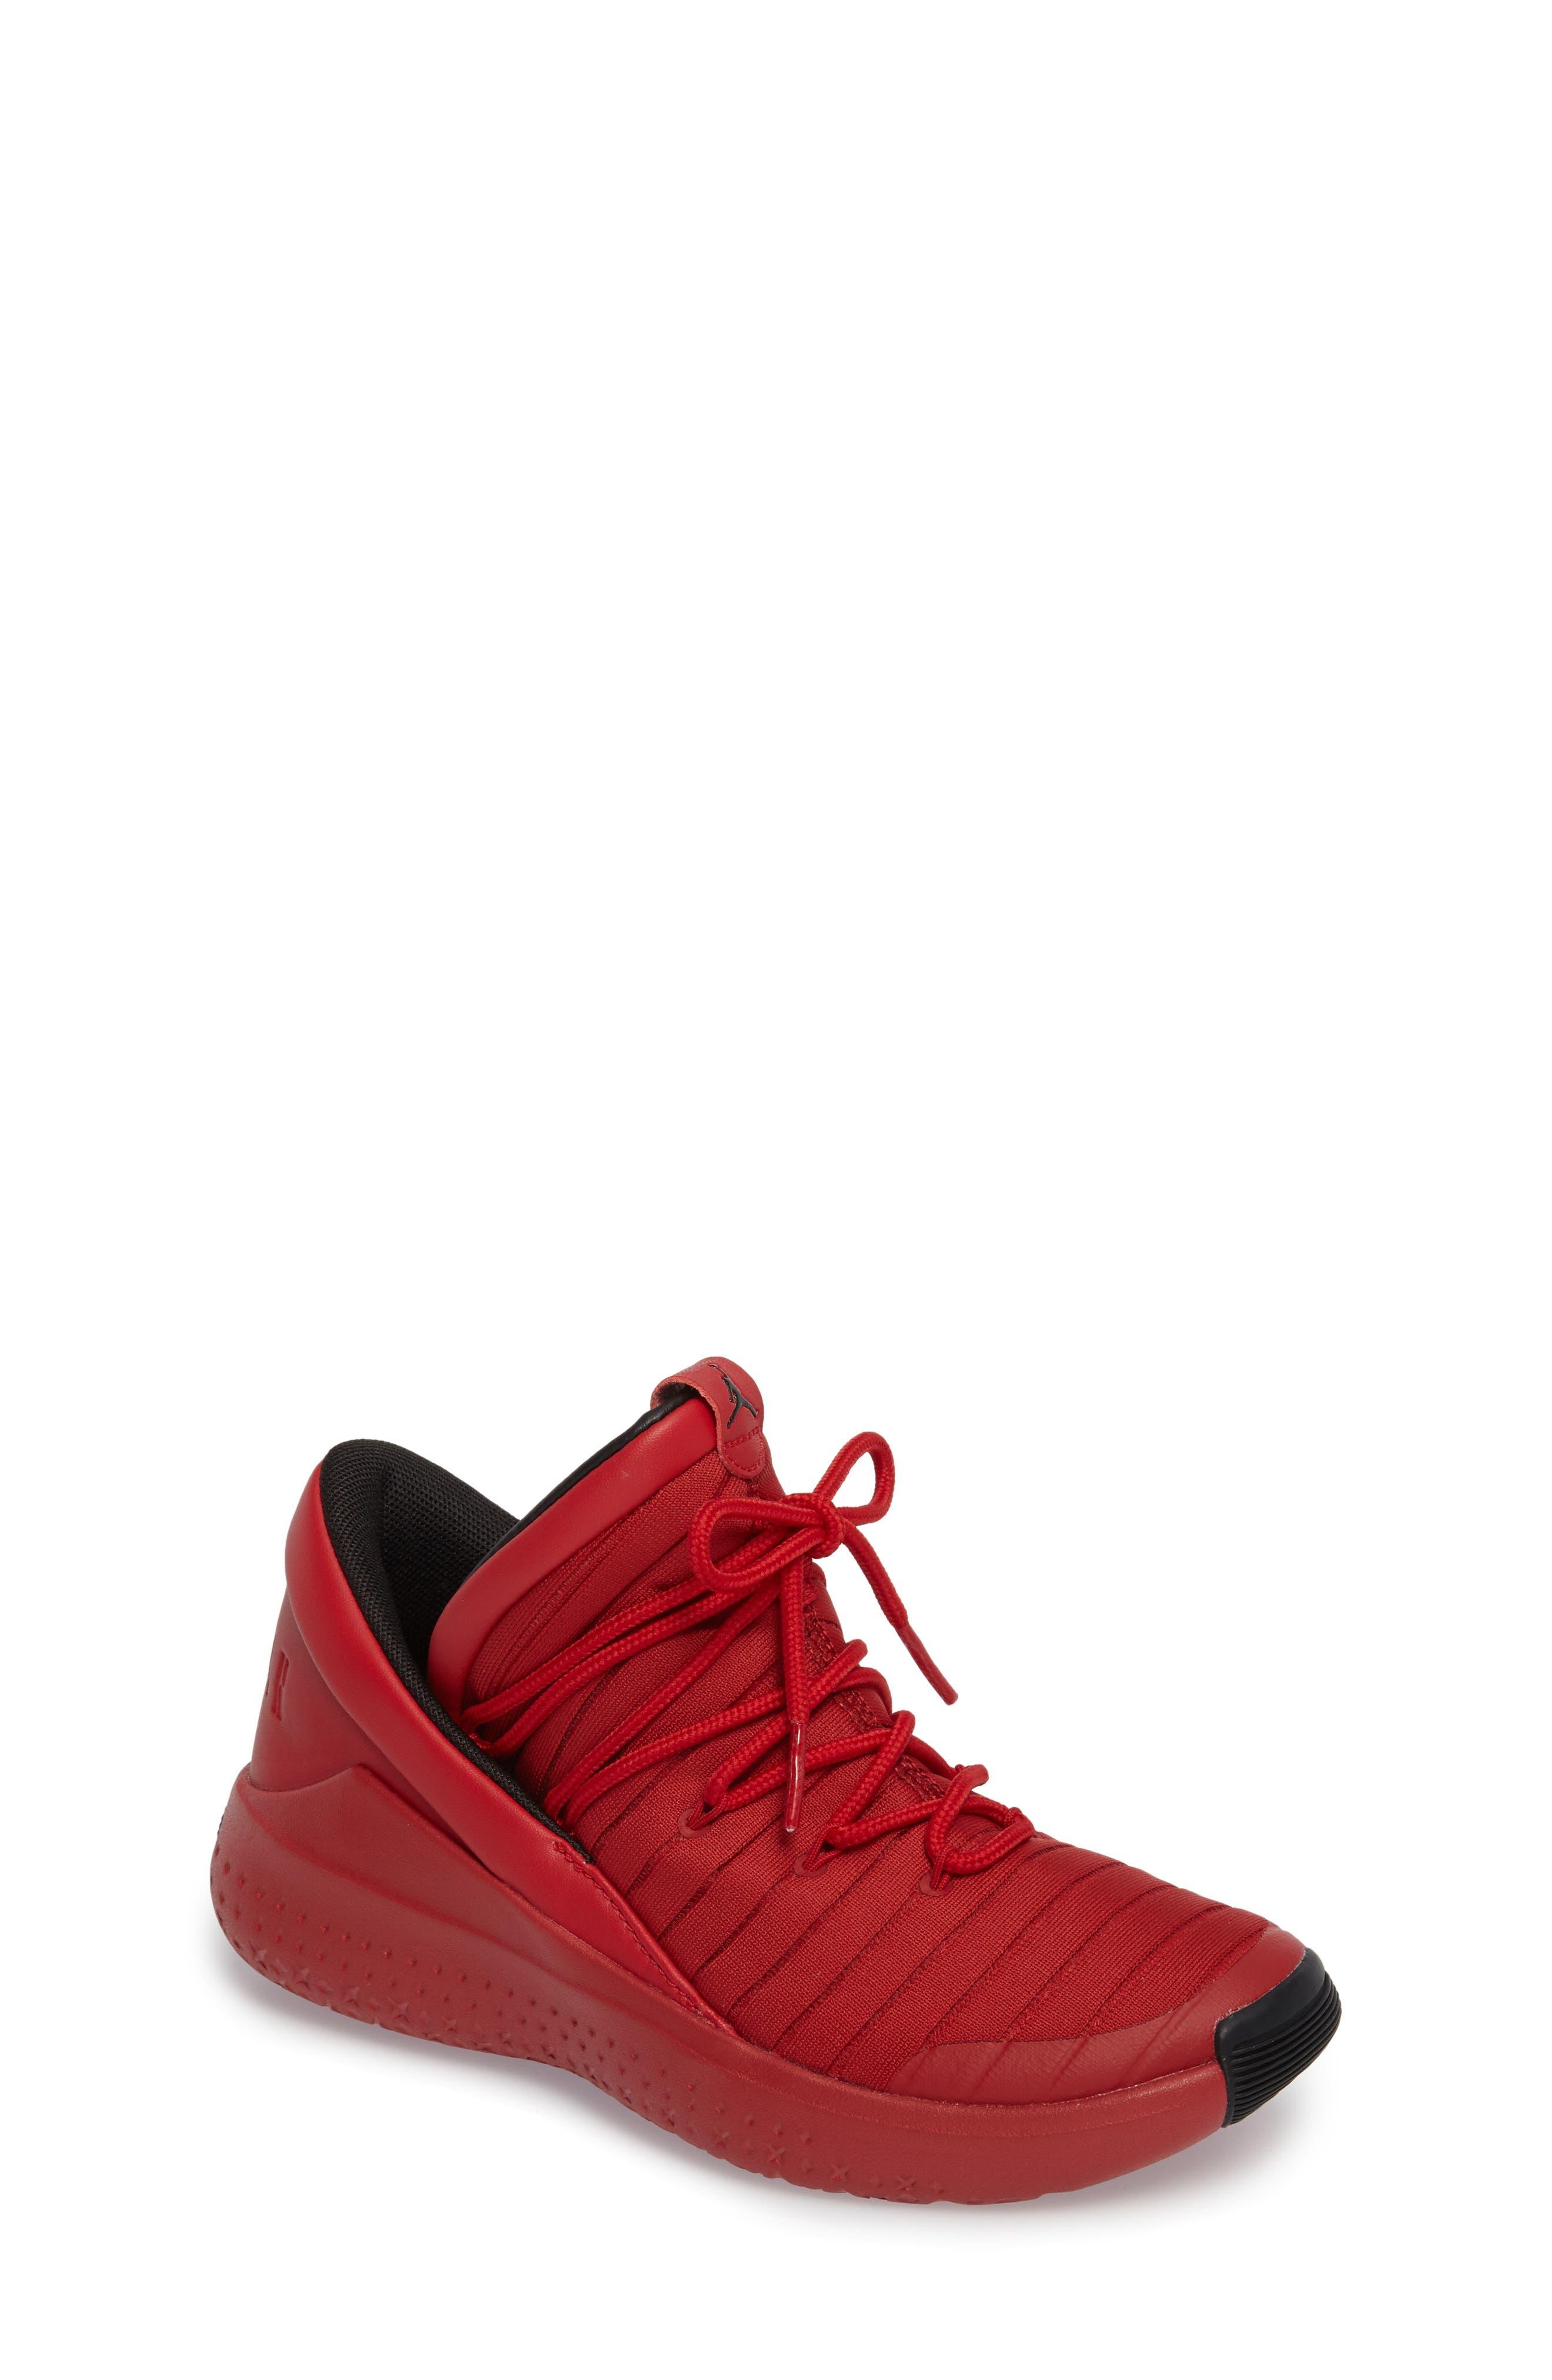 Main Image - Nike Jordan Flight Luxe Sneaker (Big Kid)